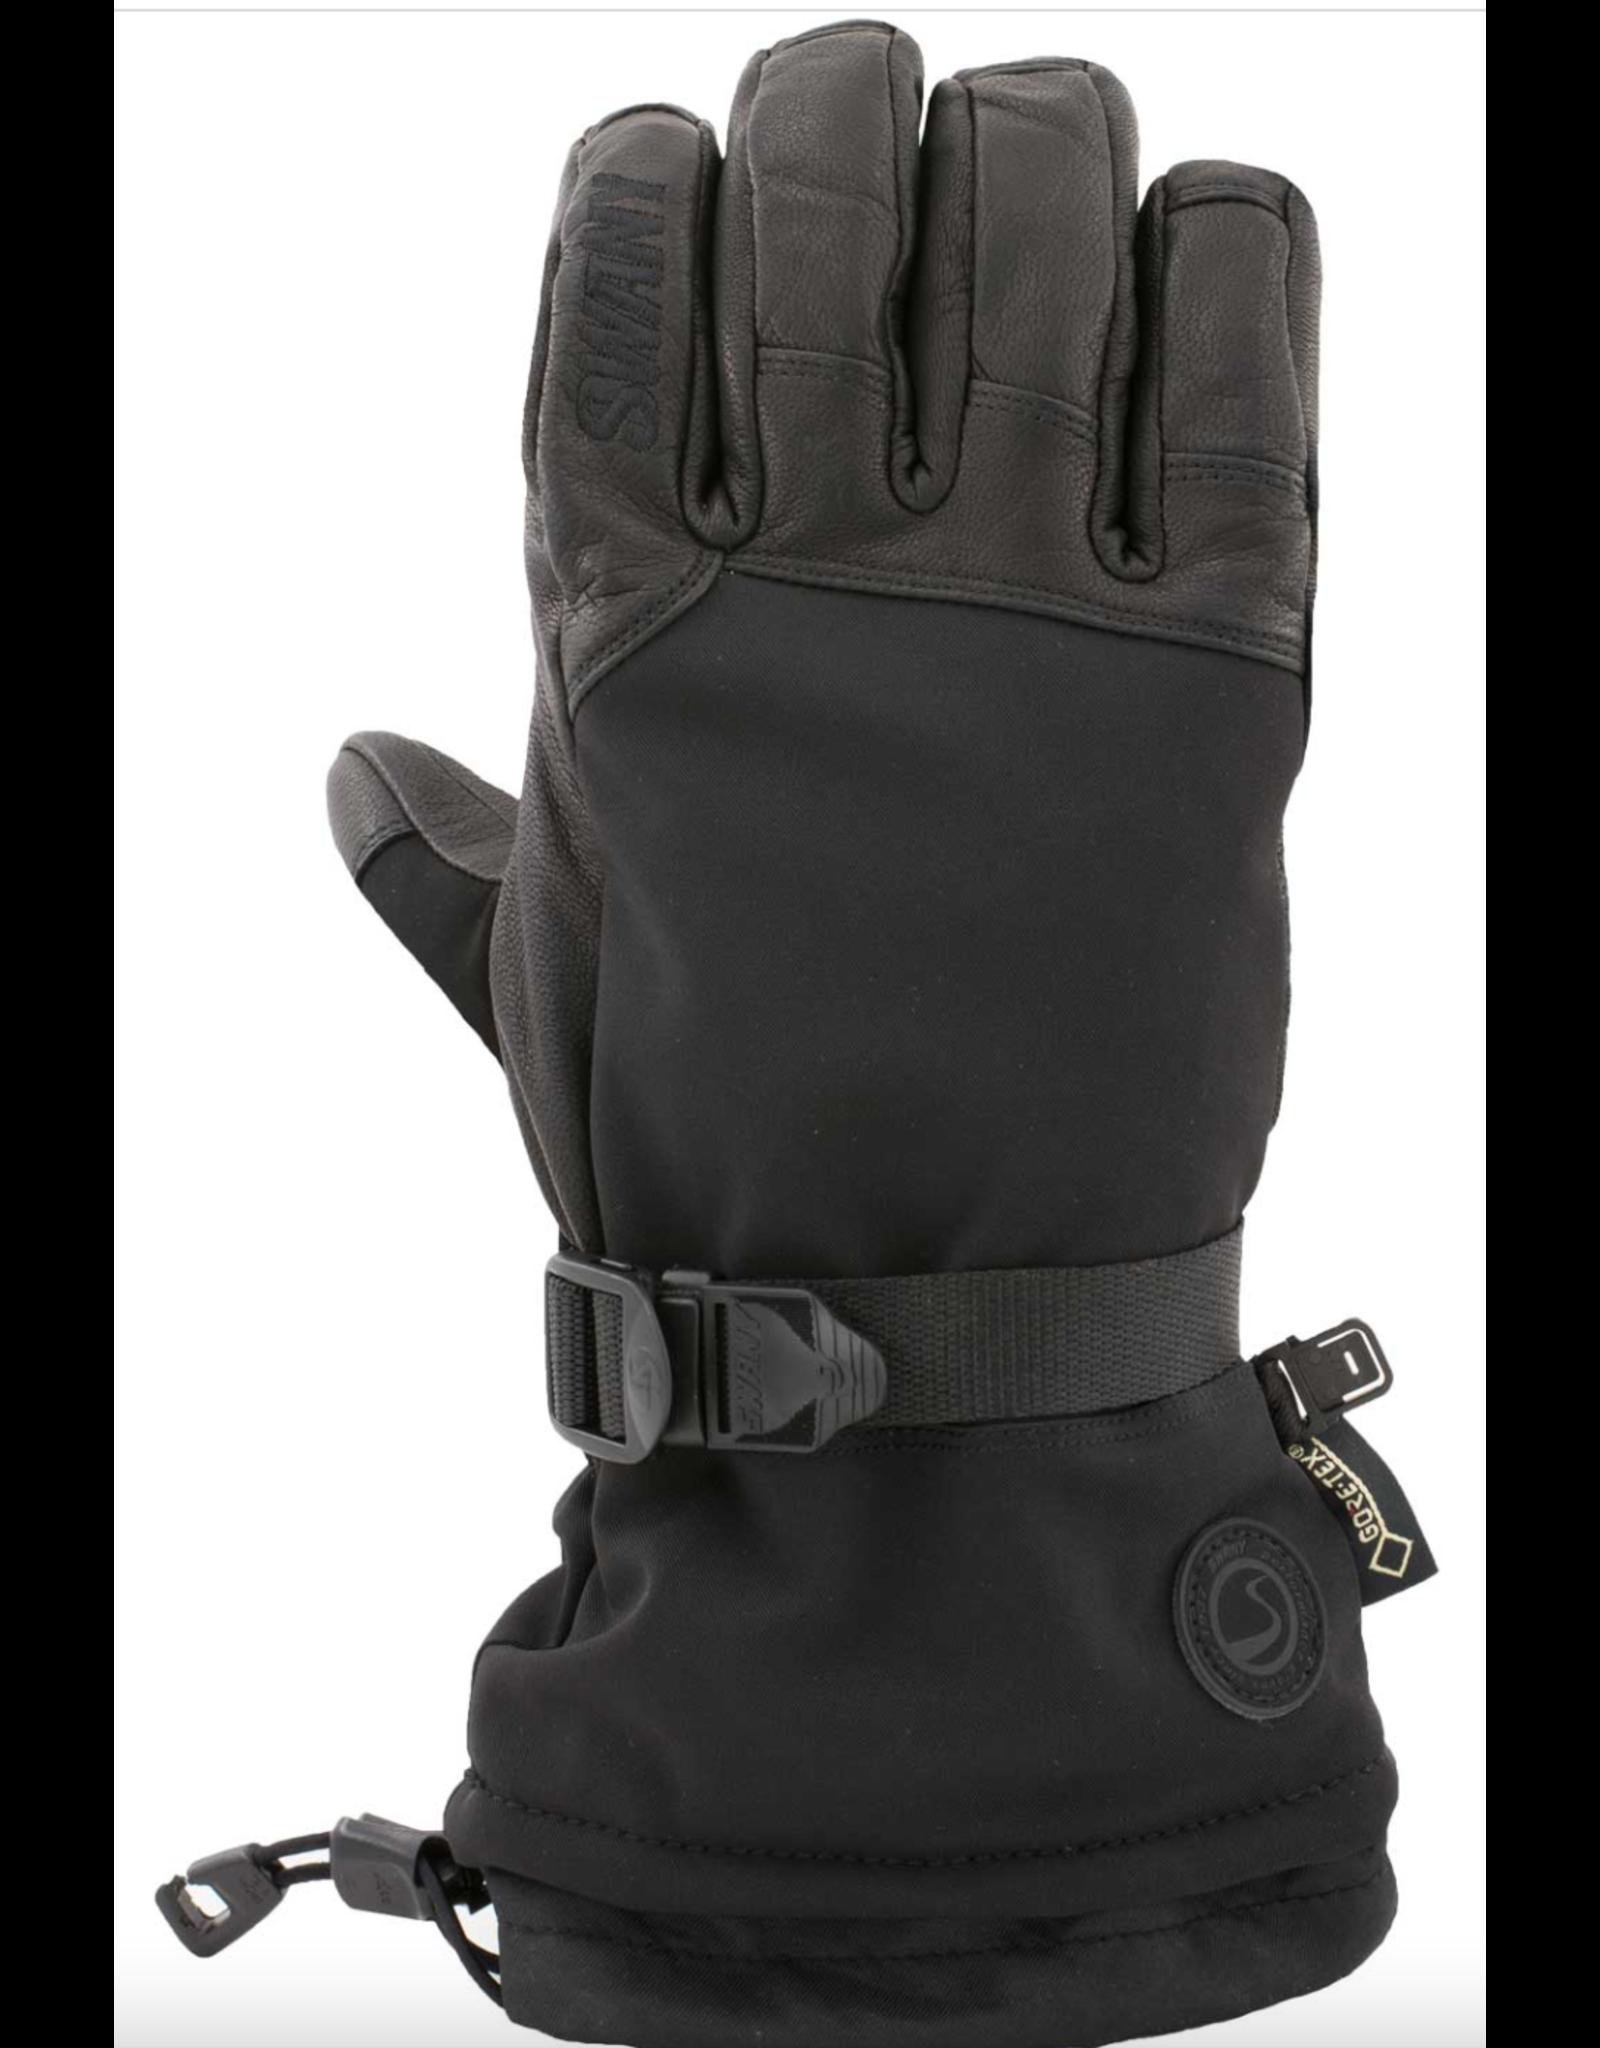 Swany GORE WINTERFALL WOMENS Gloves & Mitts 2022